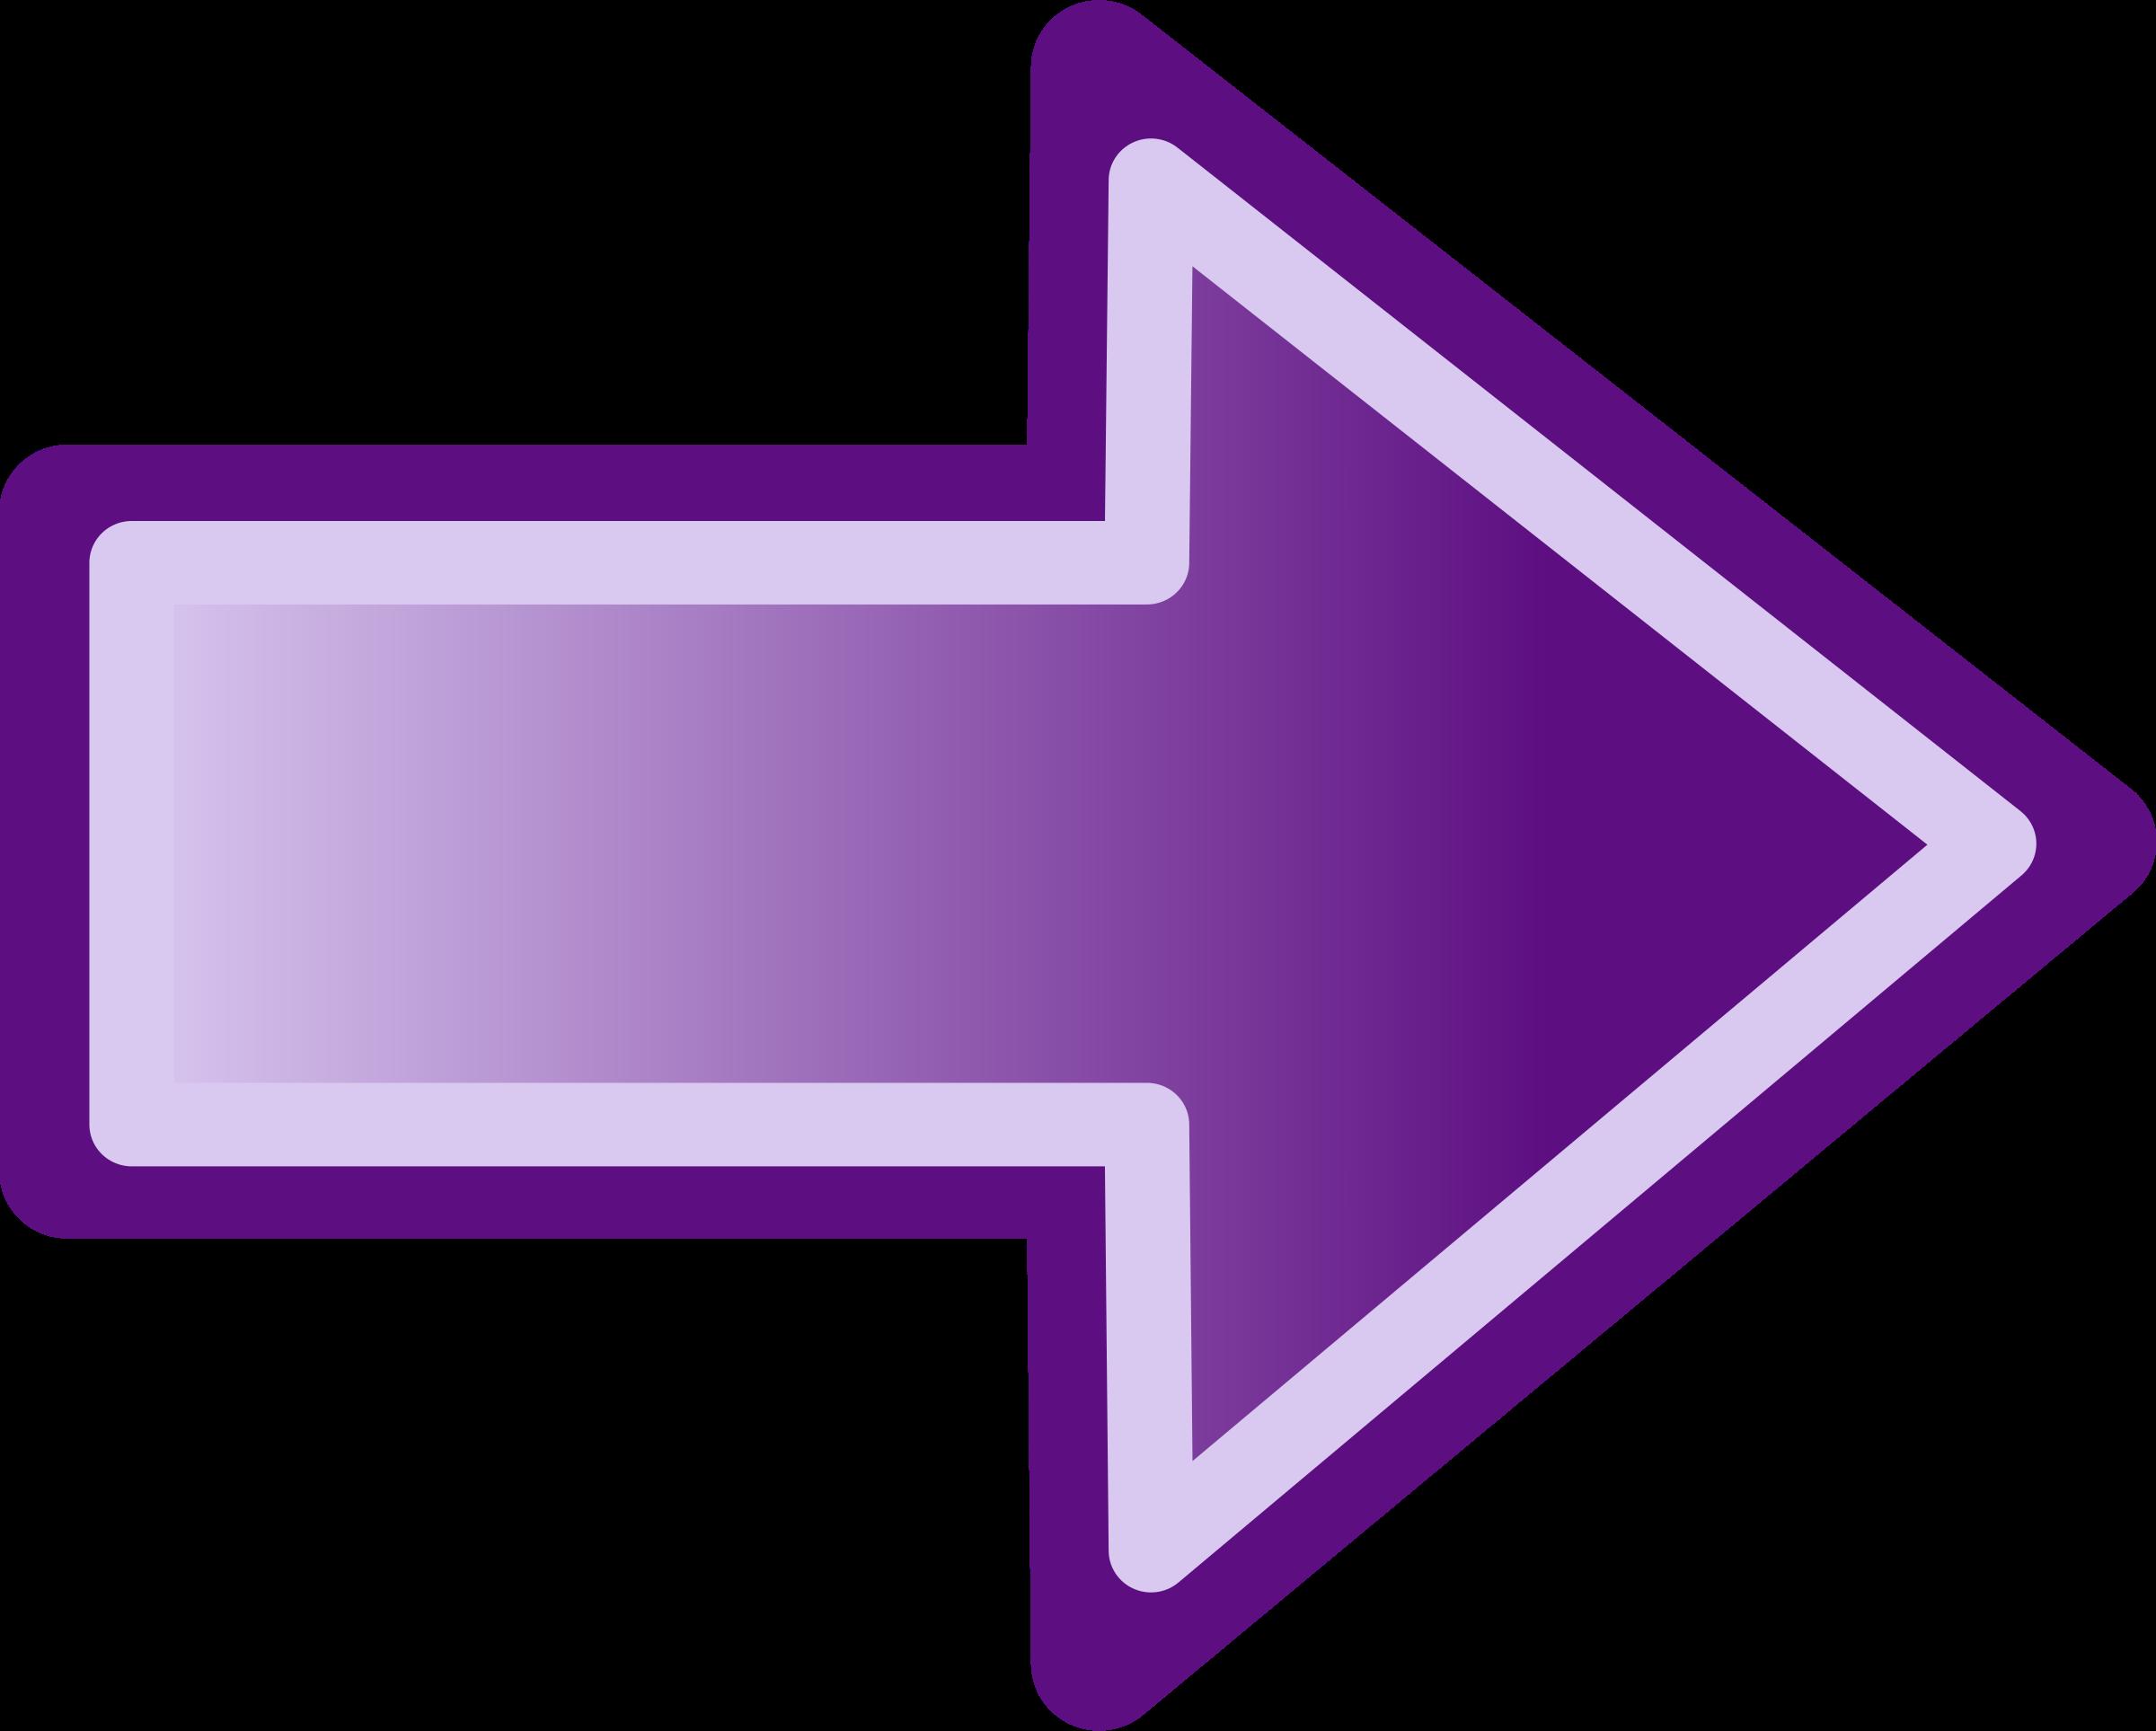 image free Arrow sign clipart. Purple shape big image.